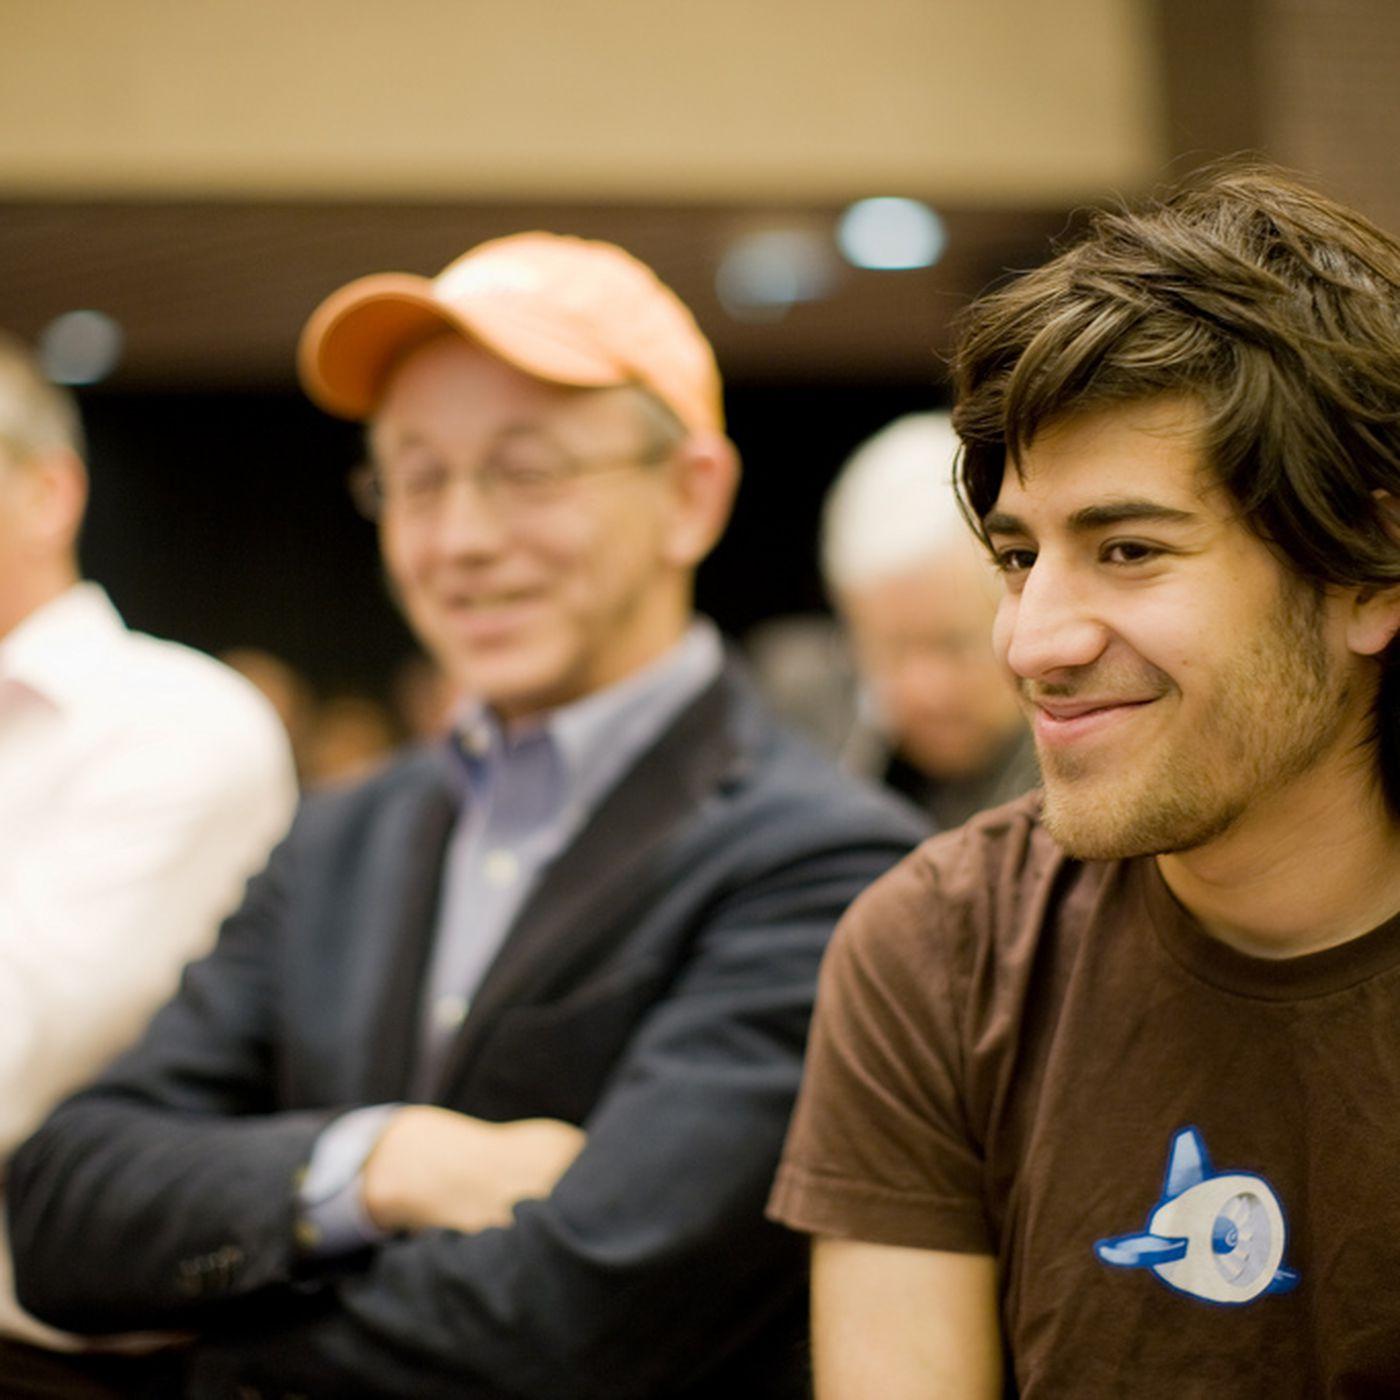 Hacker and Reddit co-founder Aaron Swartz dies - The Verge